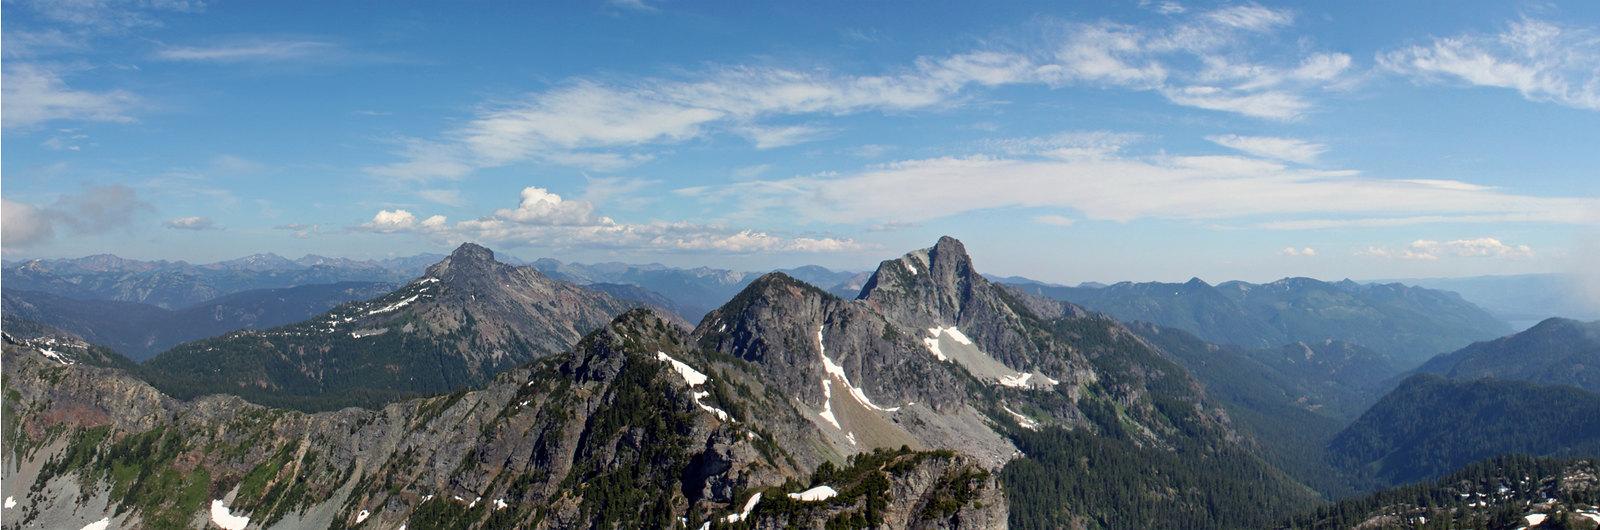 Eastern panoramic view